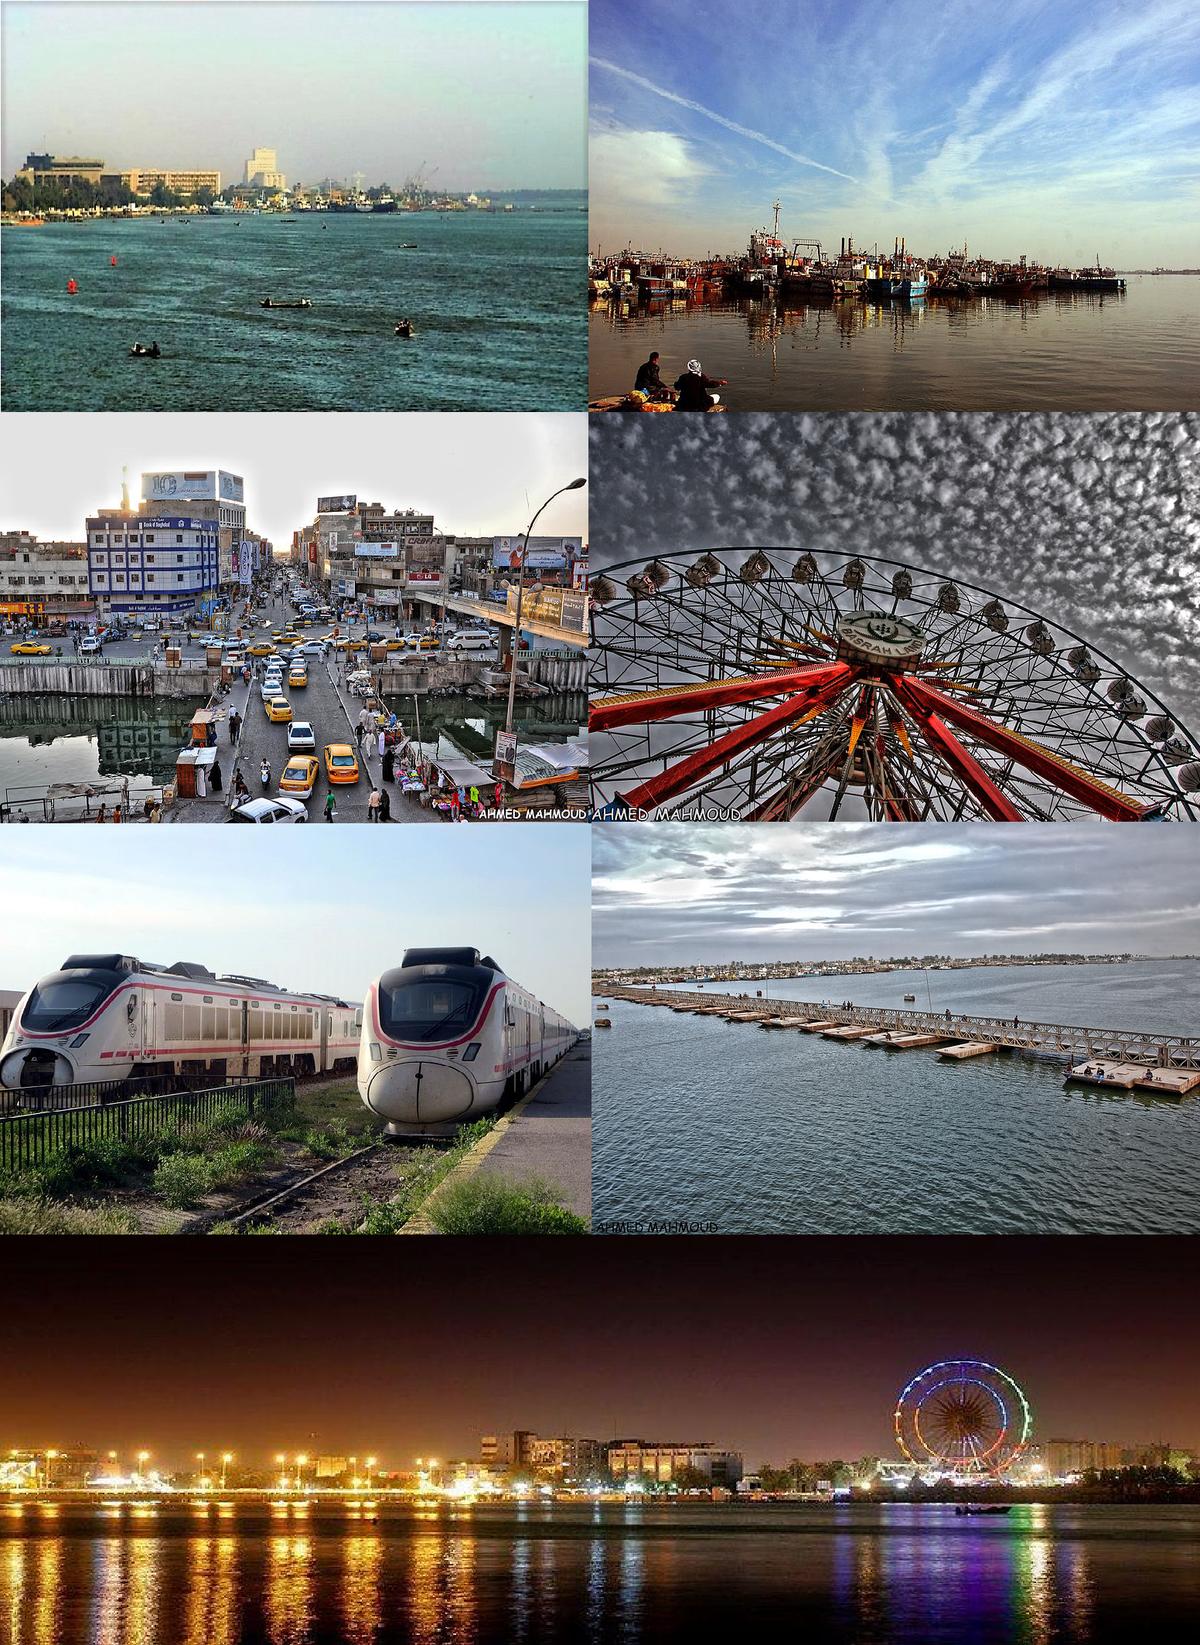 181 Million >> Basra - Wikipedia